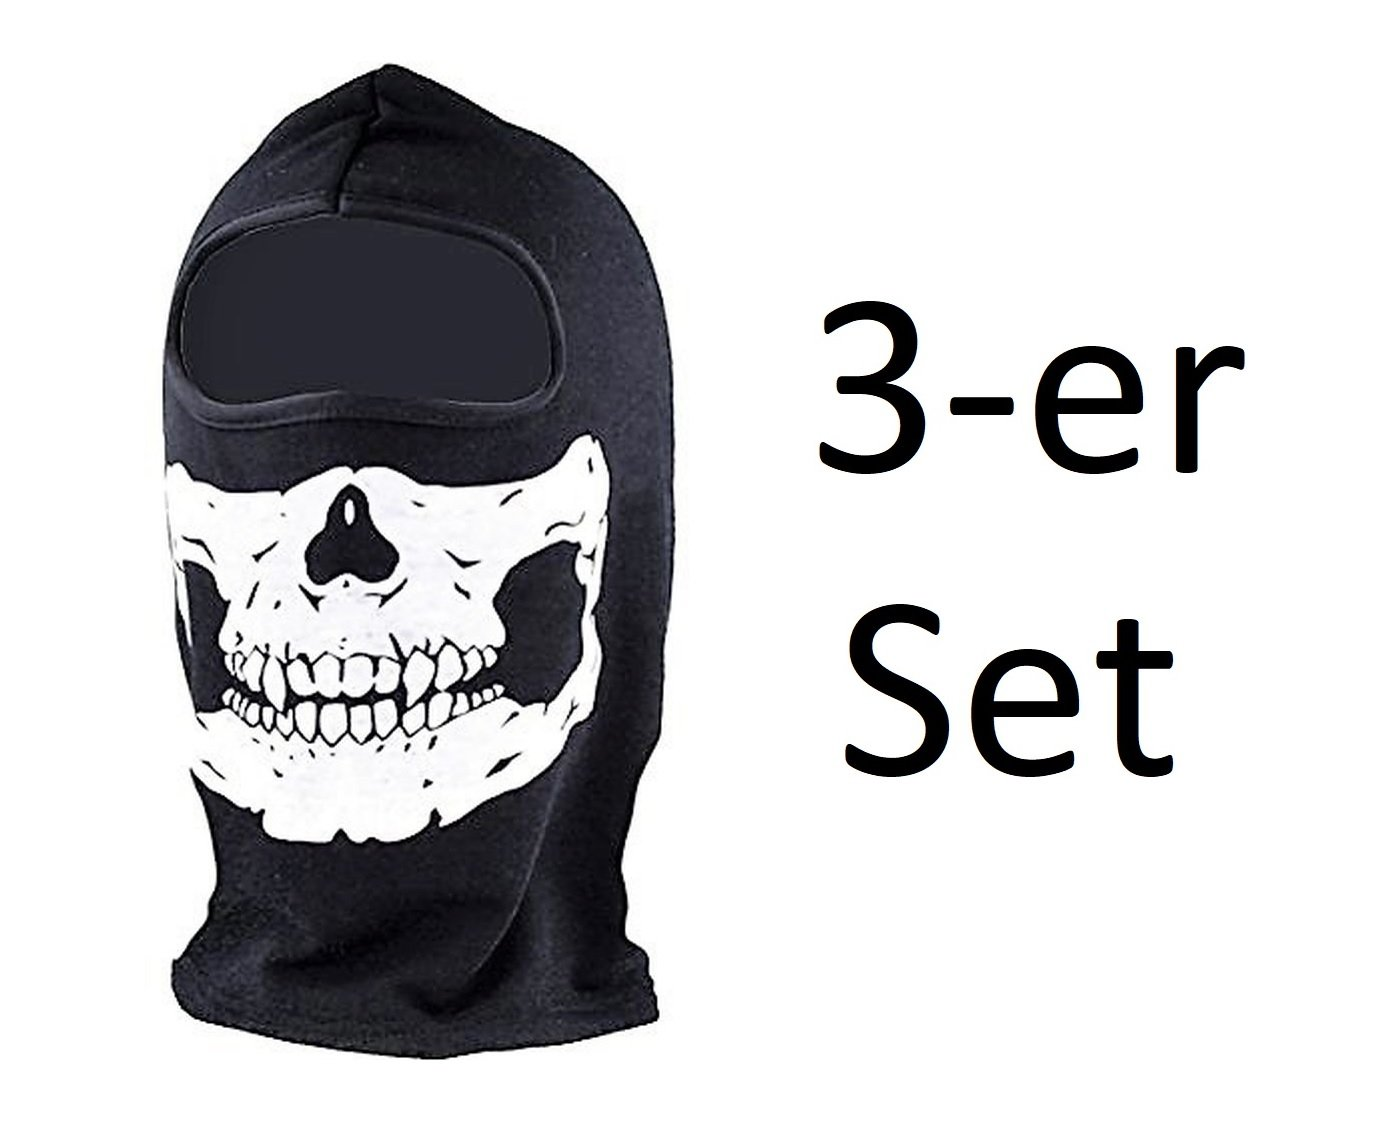 3er SET - Sturmhaube Sturmmaske Motorrad Fahrrad Paintball Gesichtsmaske - 3-Loch Variante - Acryl - Schwarz (3-er Set 3 Loch Maske) Perdules